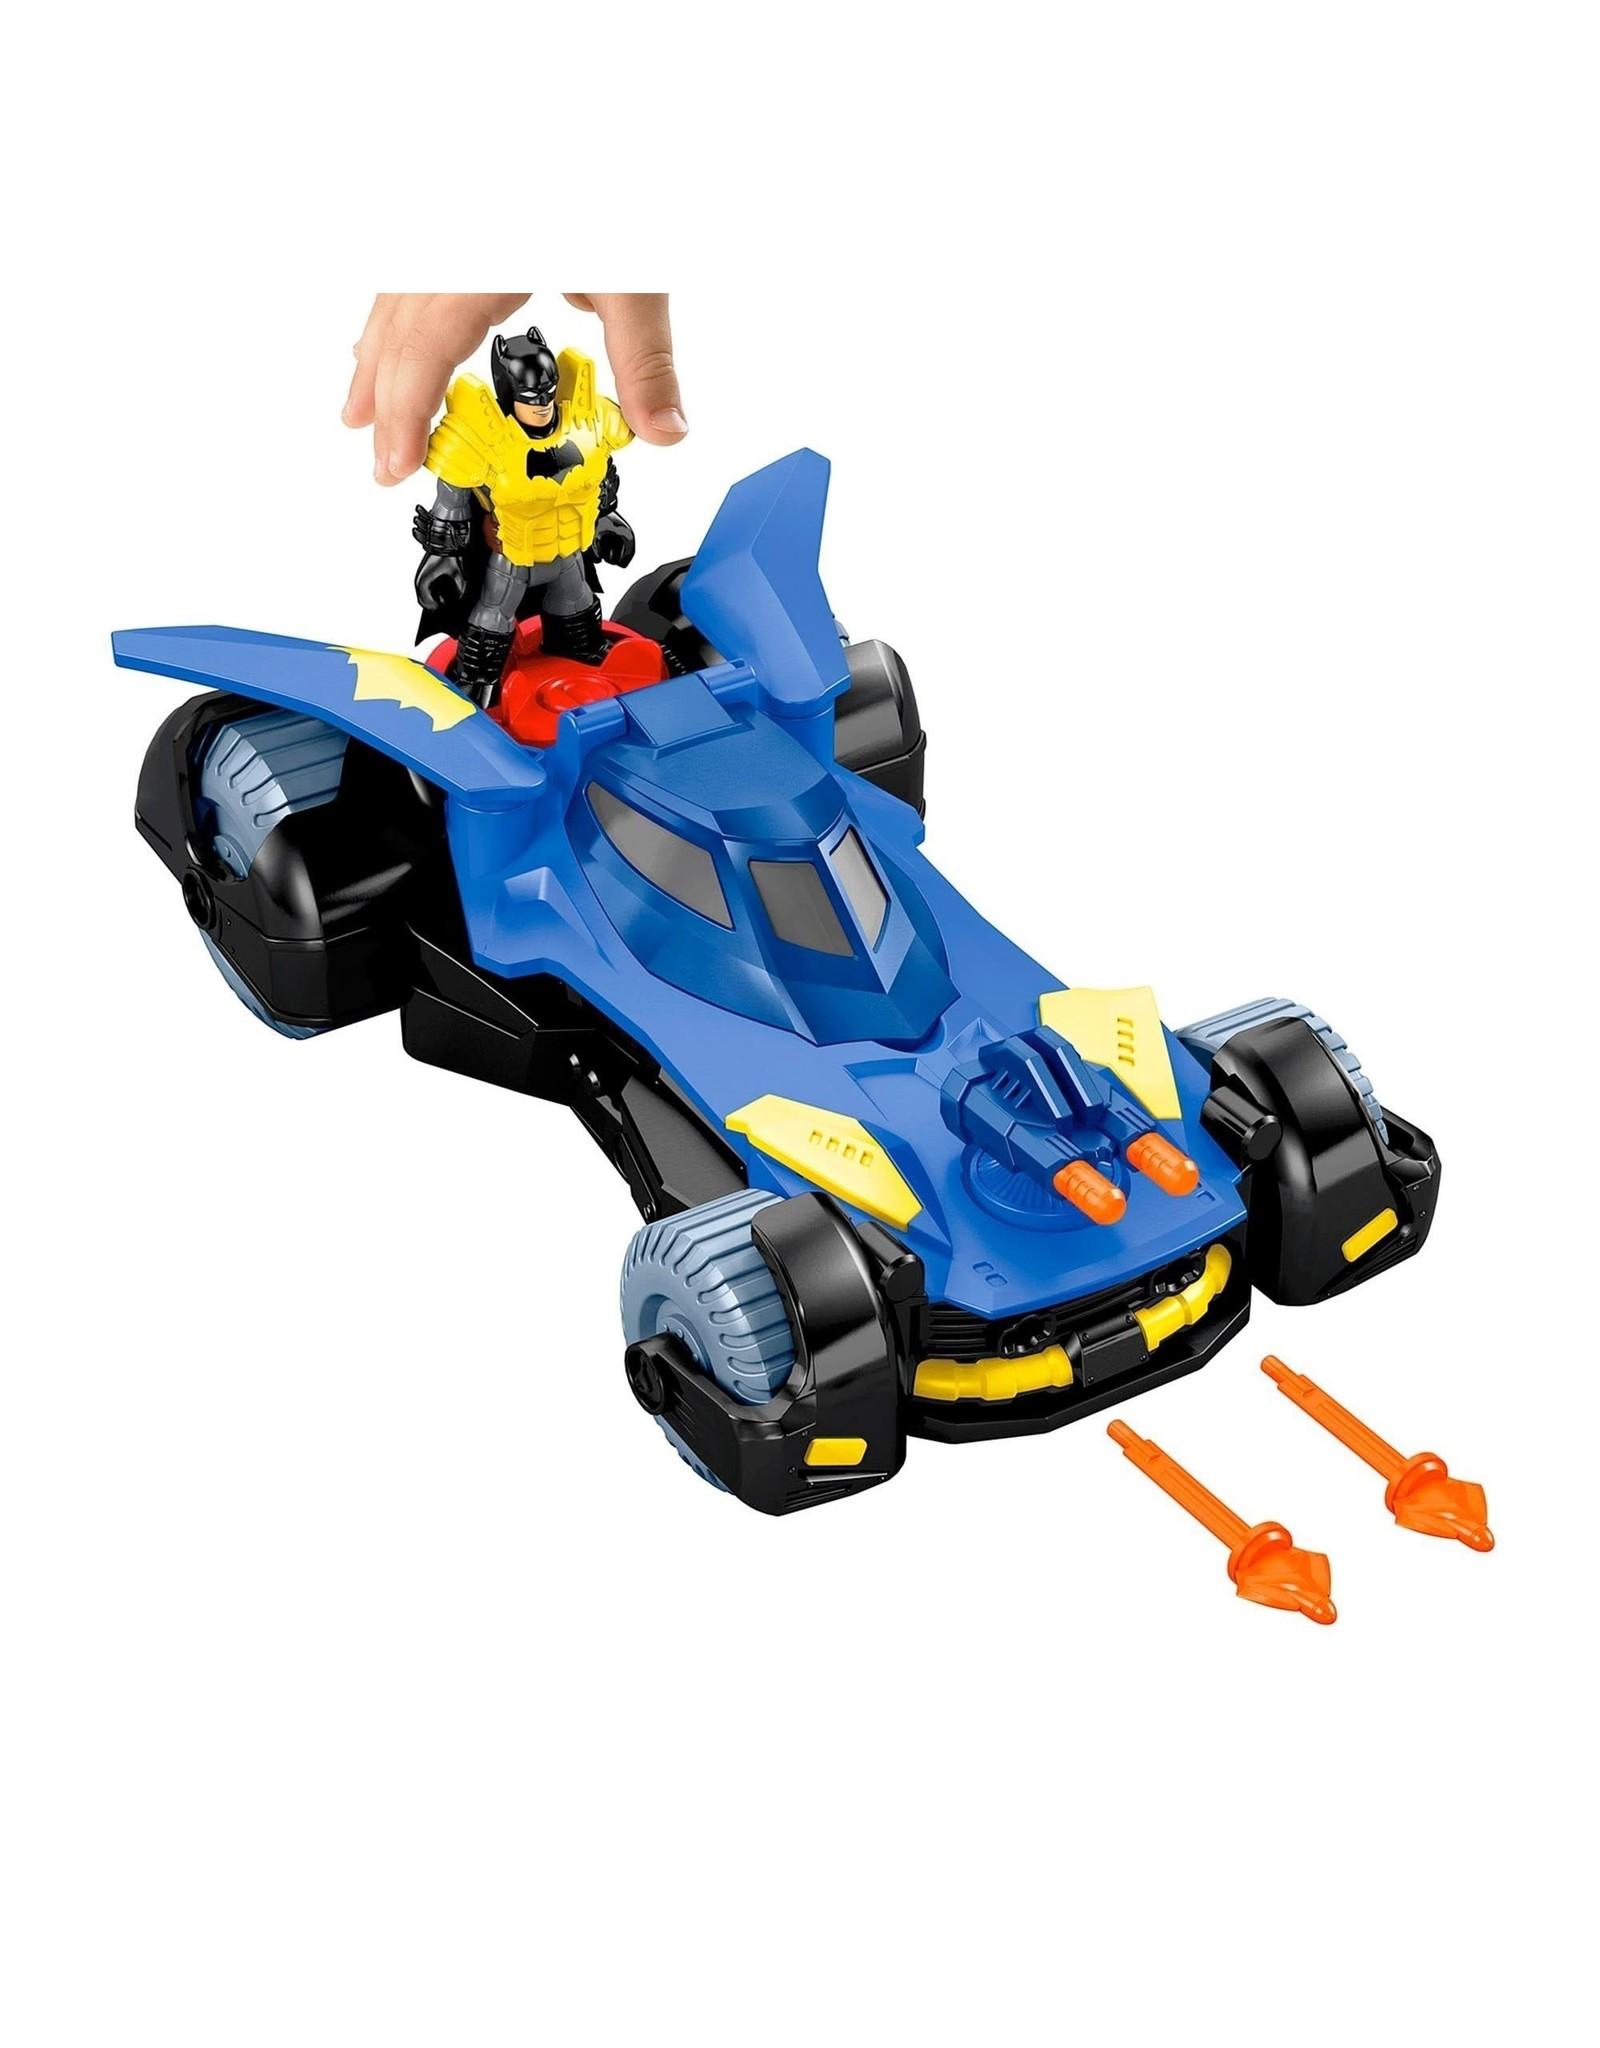 Fisher Price Imaginext DC Super Friends Batmobile